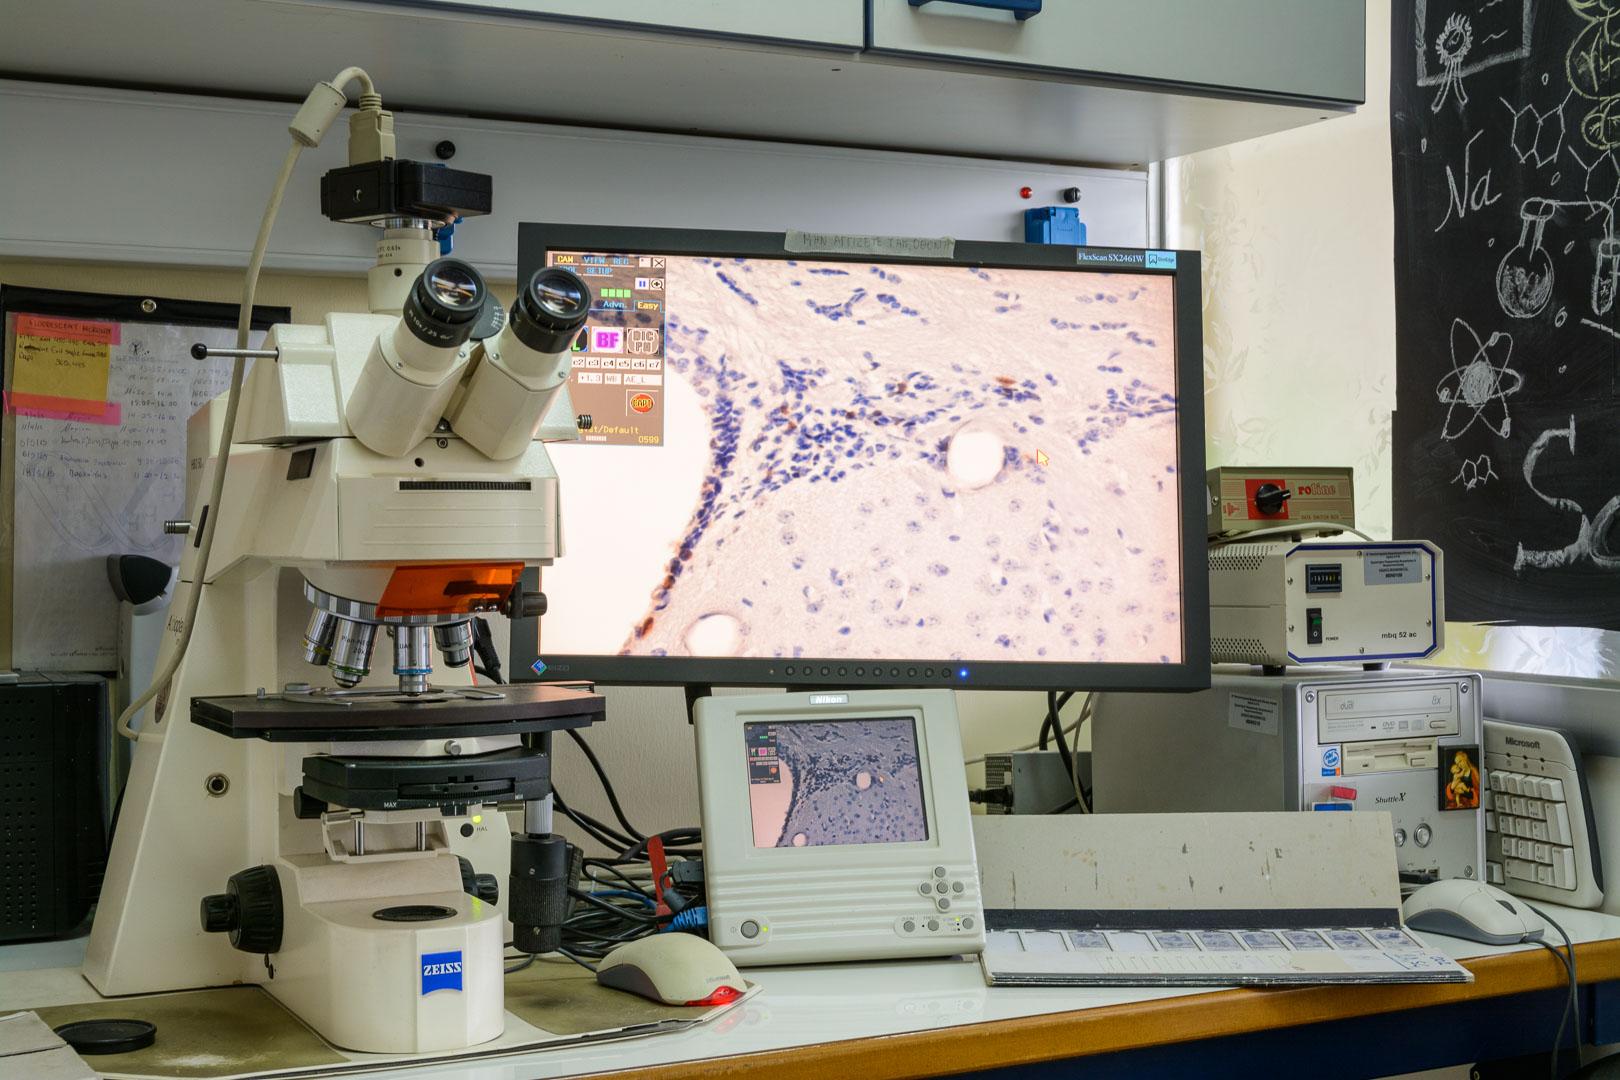 The Laboratory of Experimental Neurology and Neuroimmunology